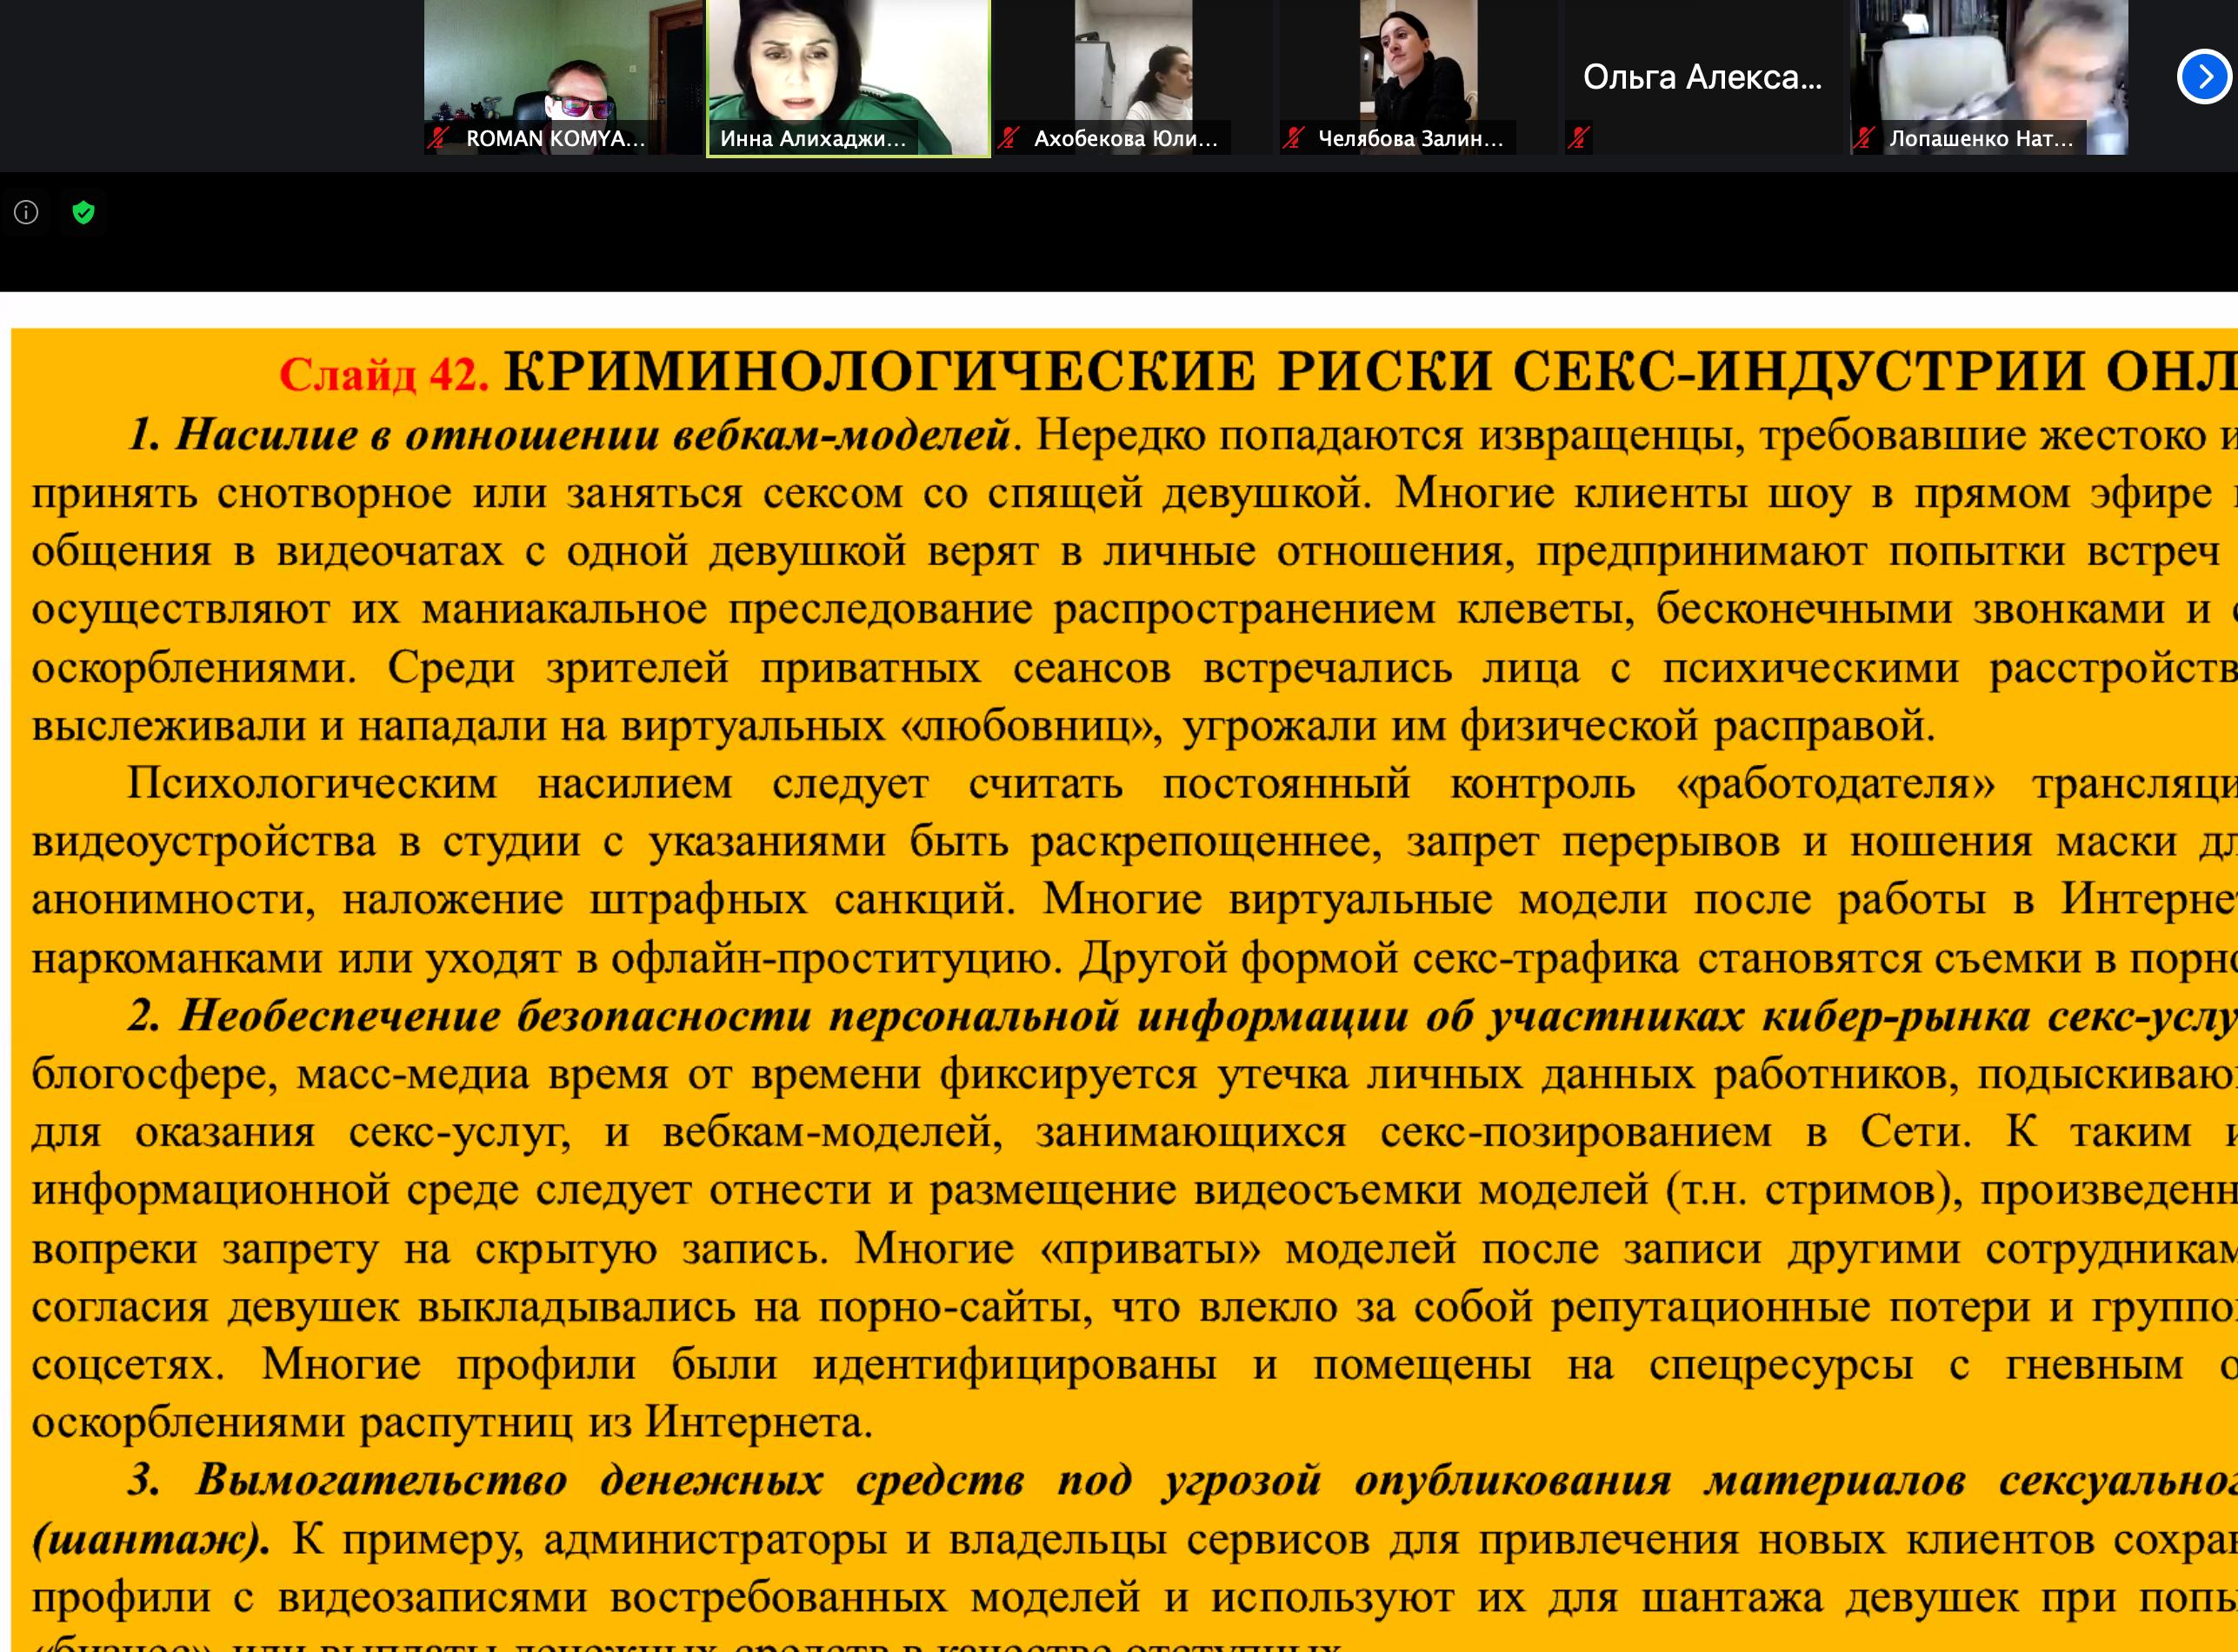 Снимок экрана 2020-12-23 в 18.50.00